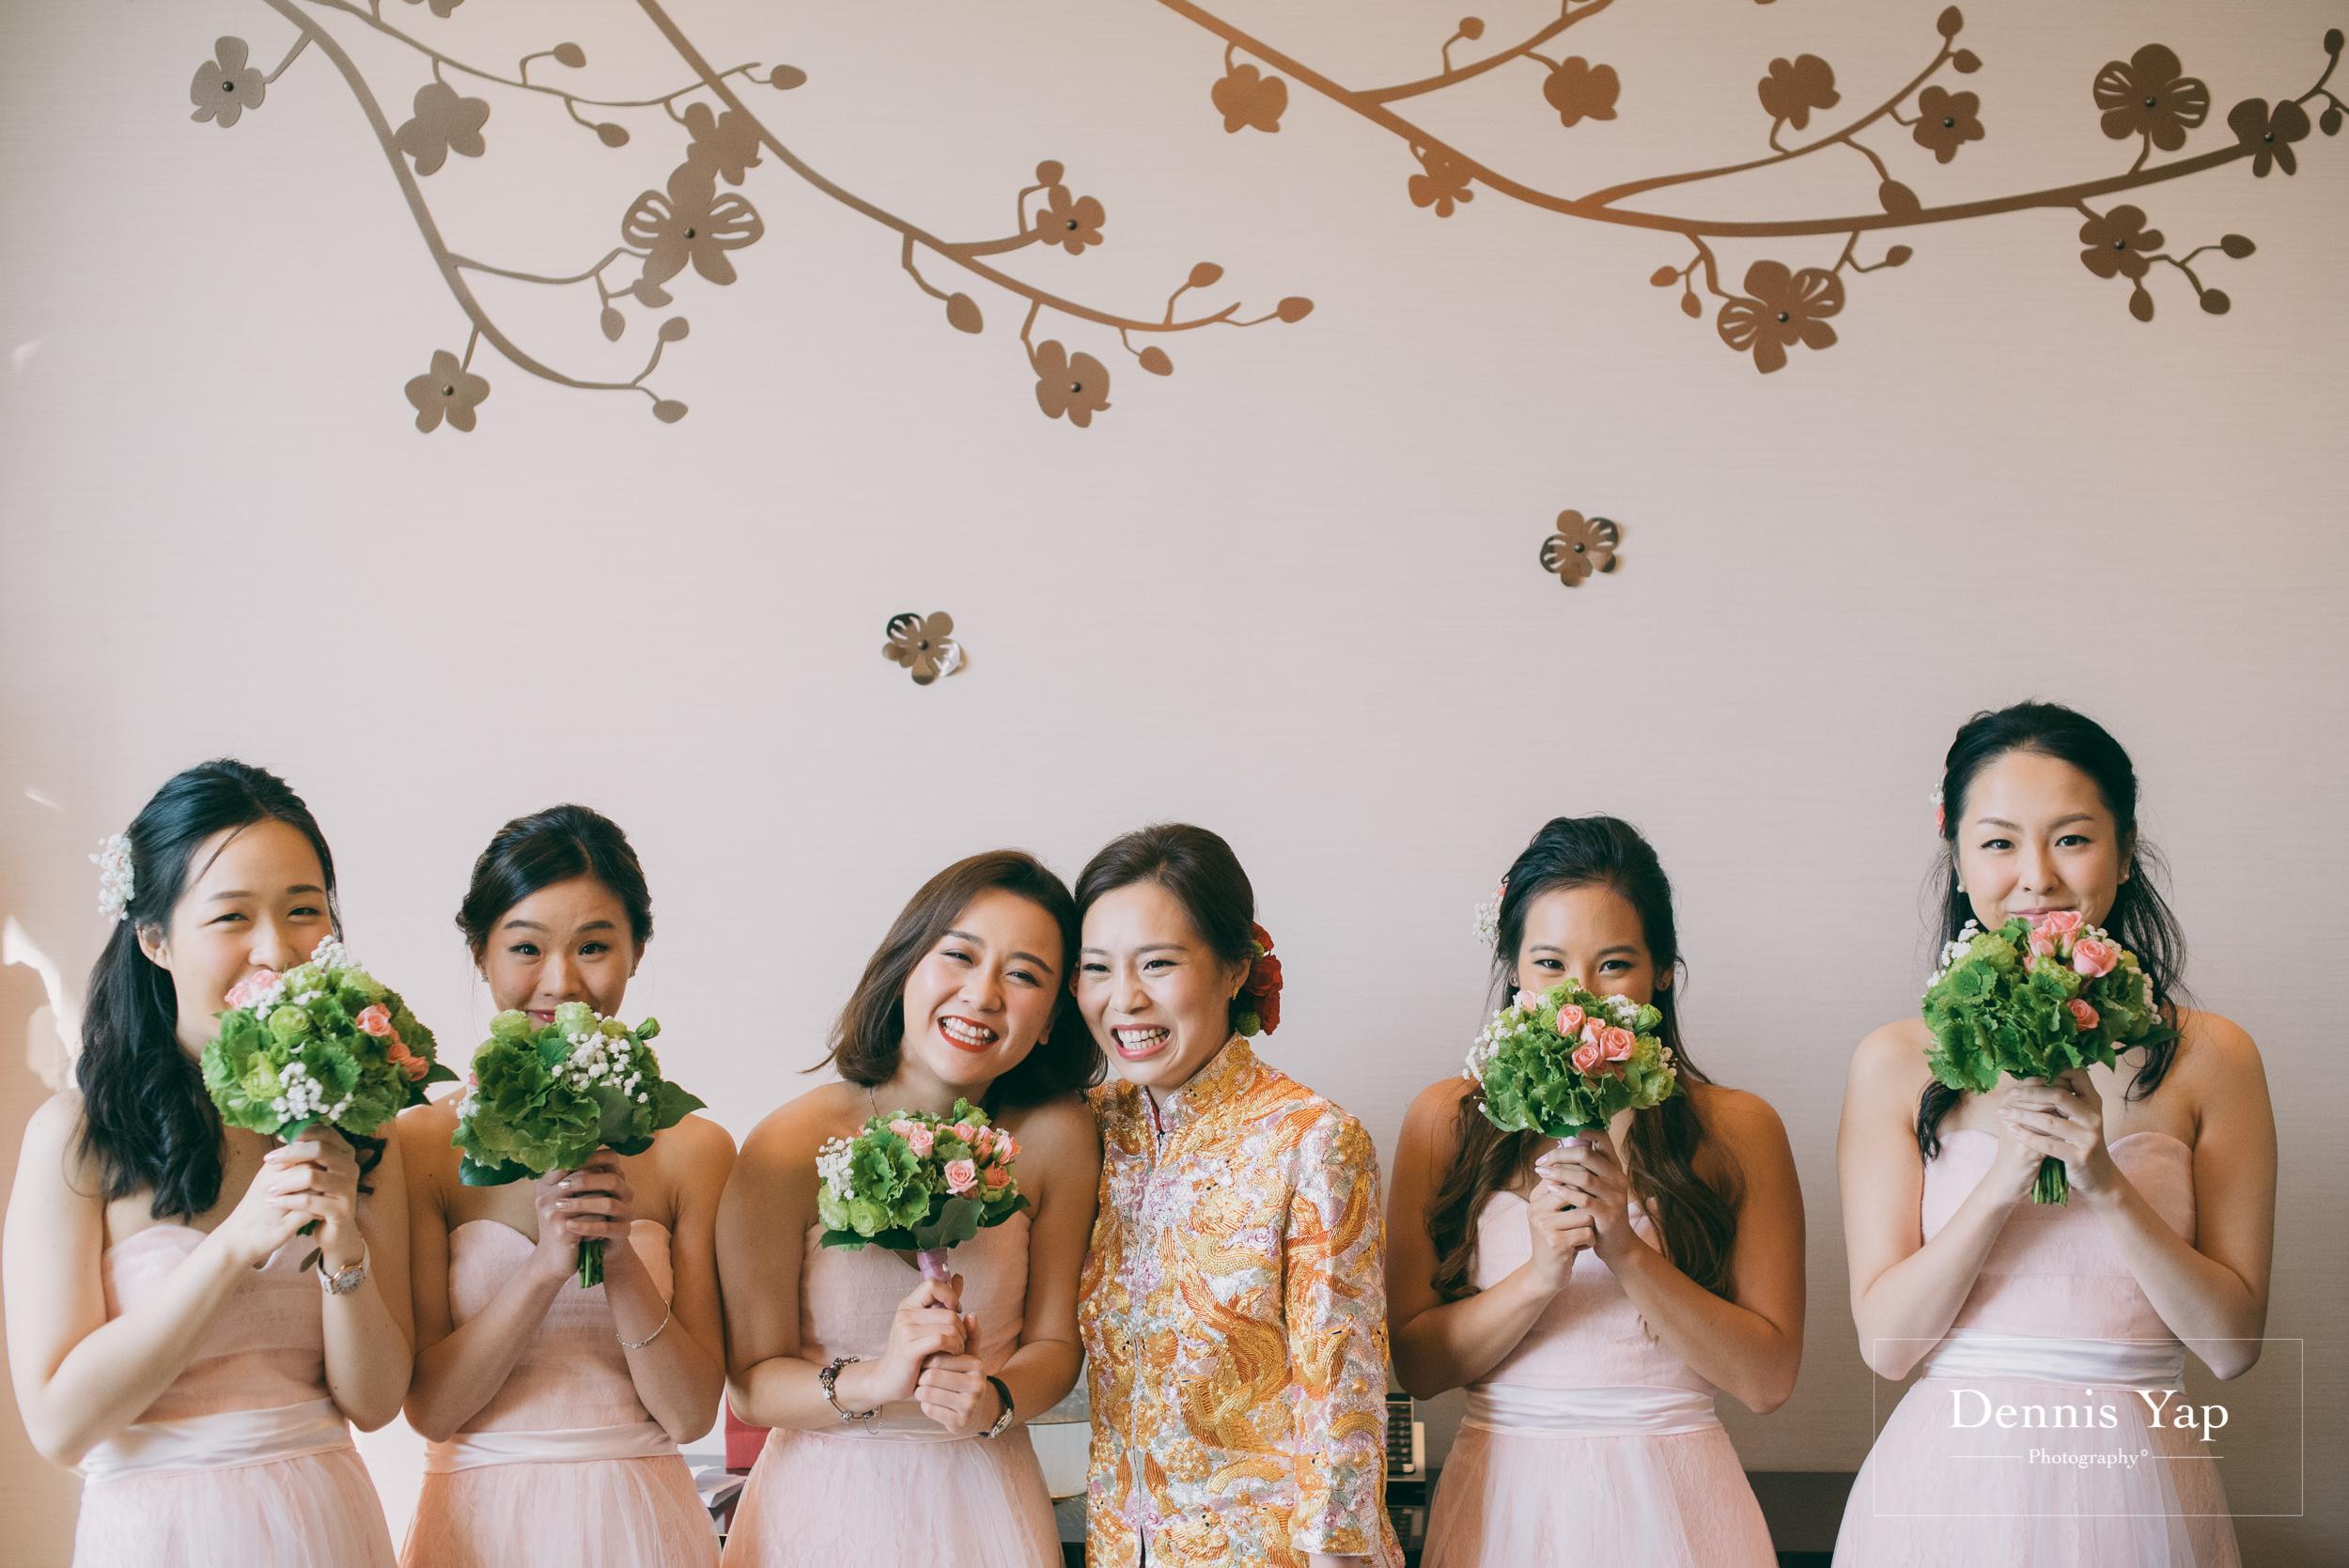 jason crystal wedding day gate crash hong kong garden wedding dennis yap photography-6.jpg